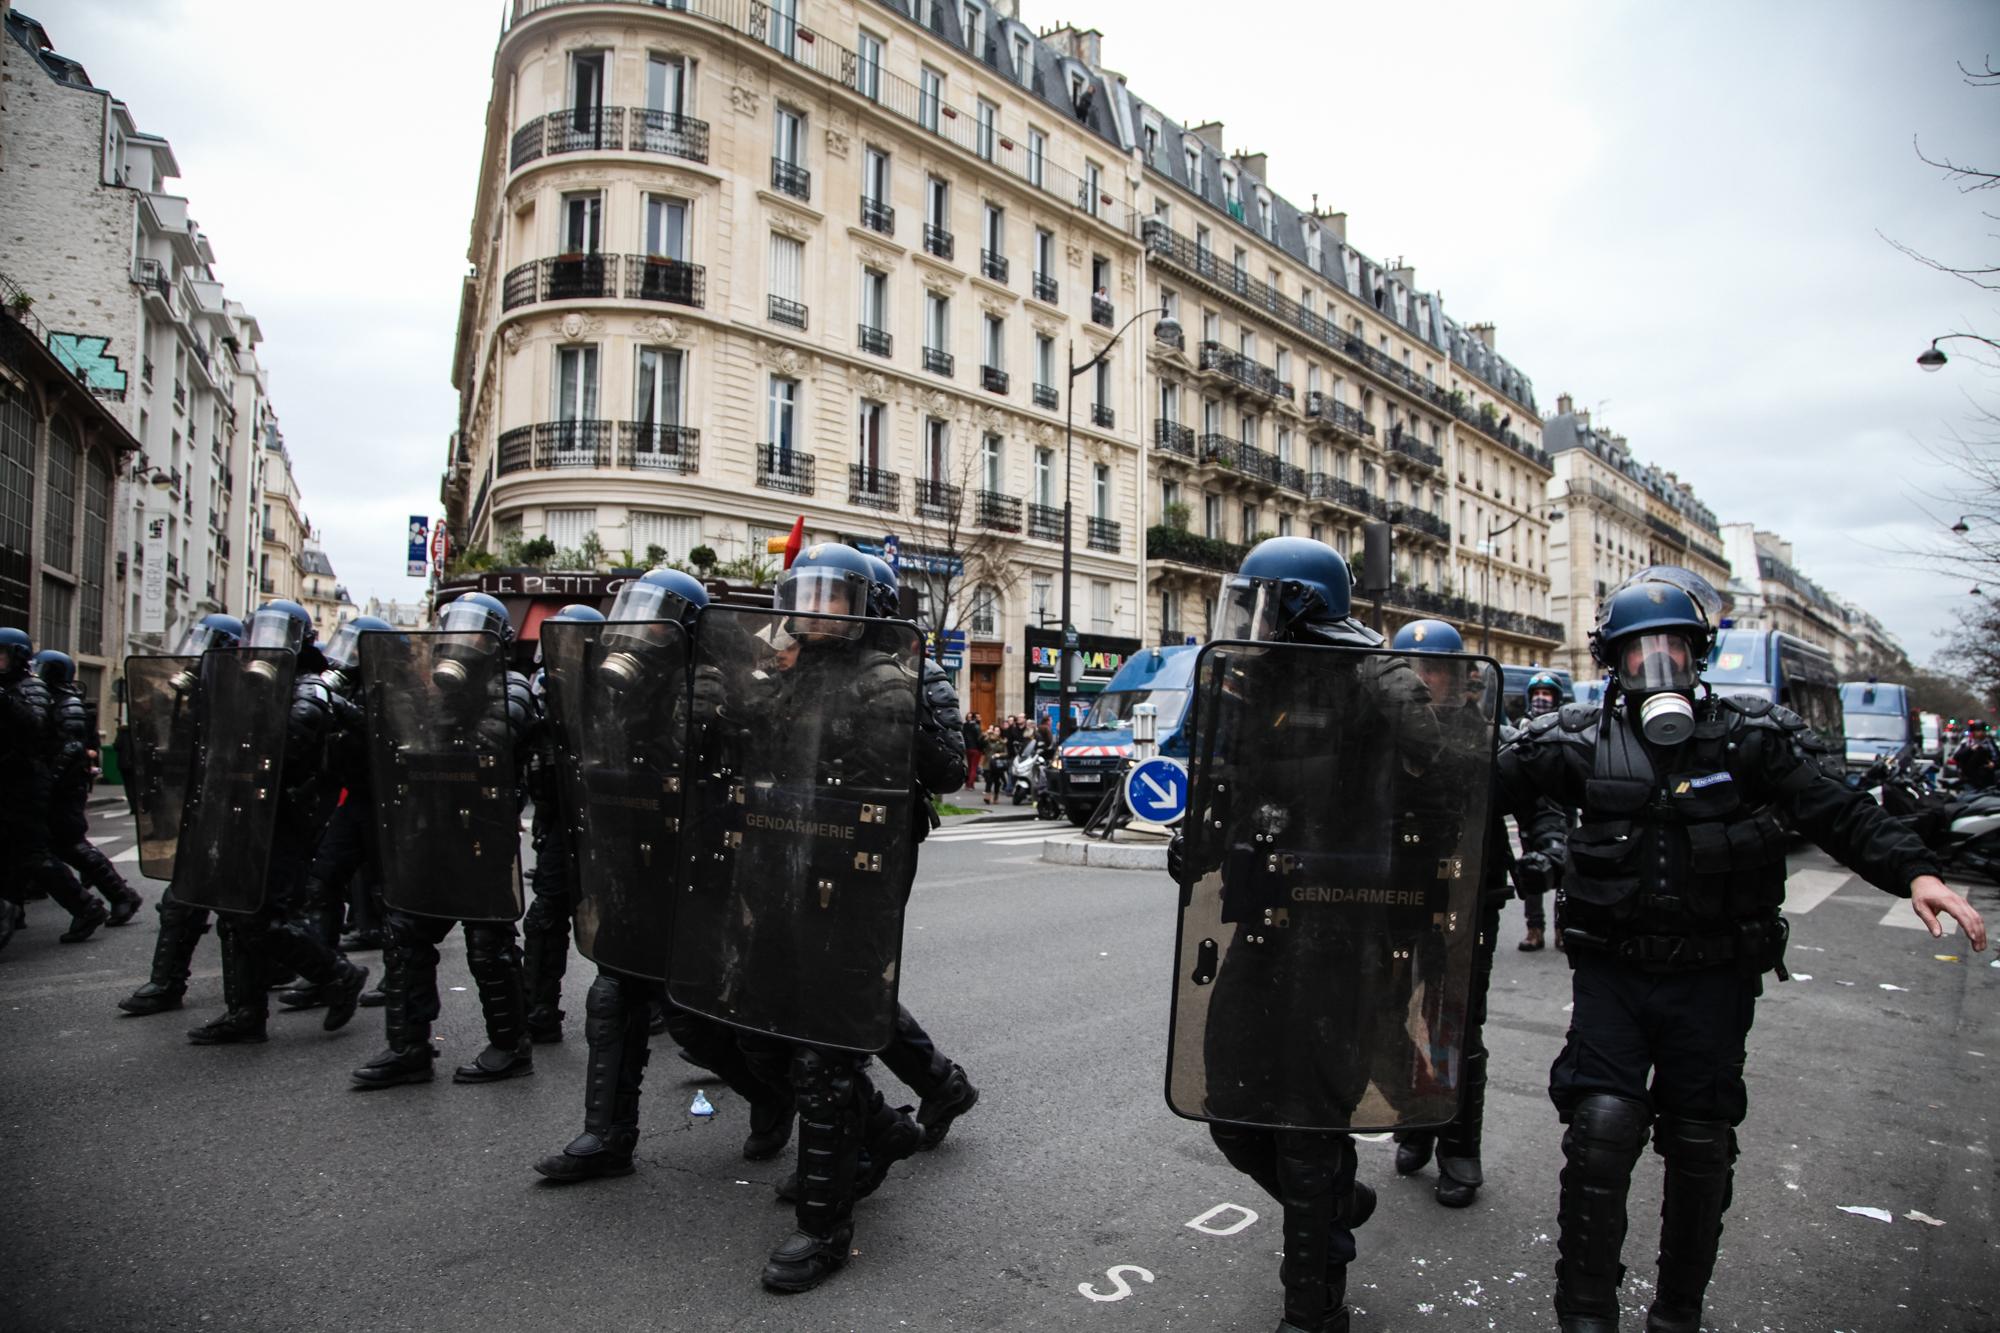 11-201703-MARCHE-CONTRE-VIOLENCES-POLICIERES©Augustin-Le_Gall-Haytham-Pictures-IMG_3820.jpg